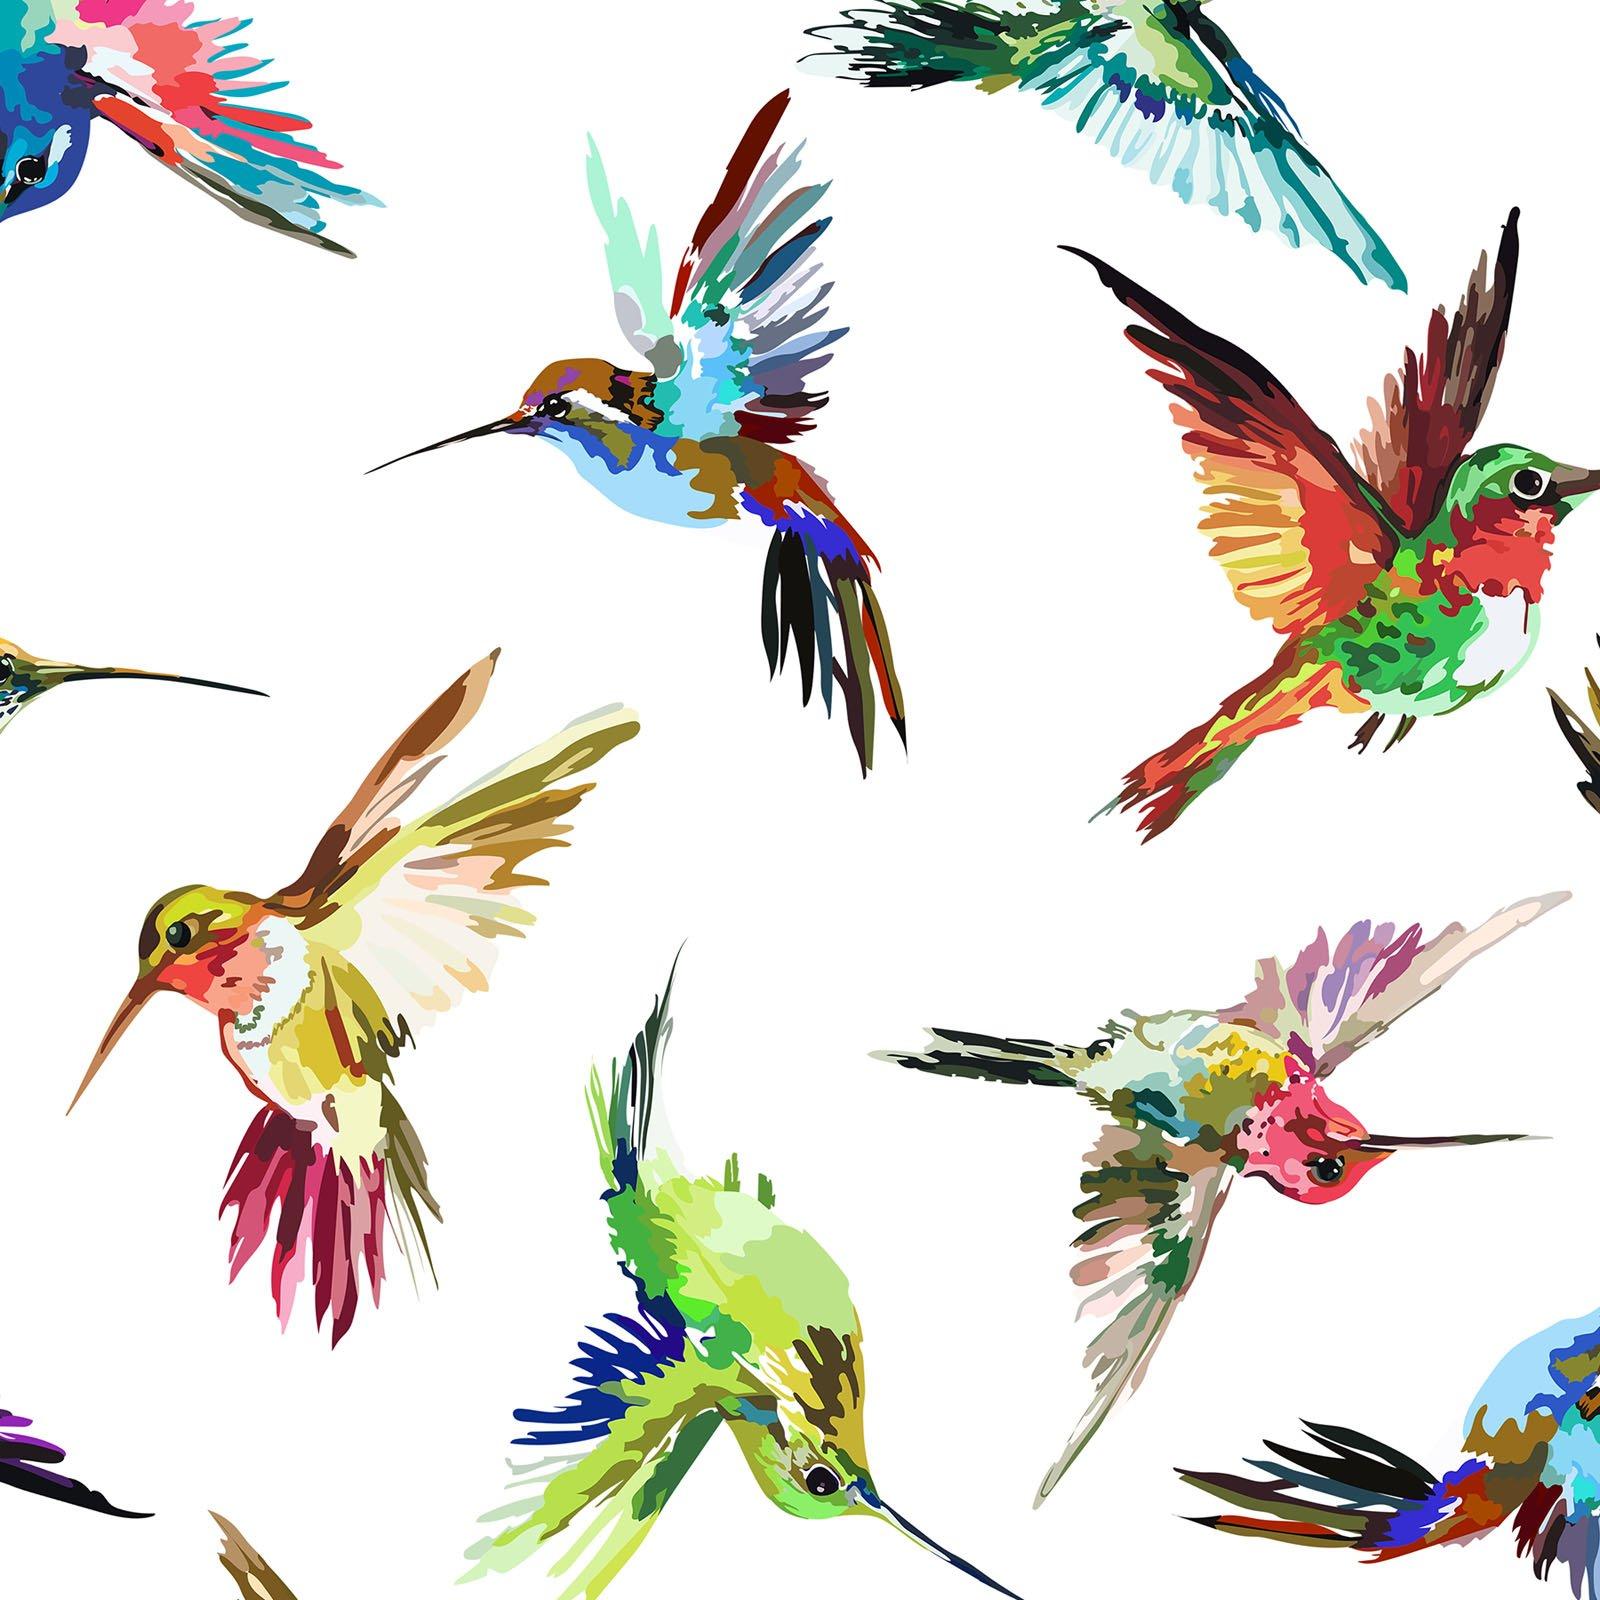 **INTH-10HL 1 - HUMMINGBIRD LANE BY ITB STUDIO HUMMINGBIRDS MULTI